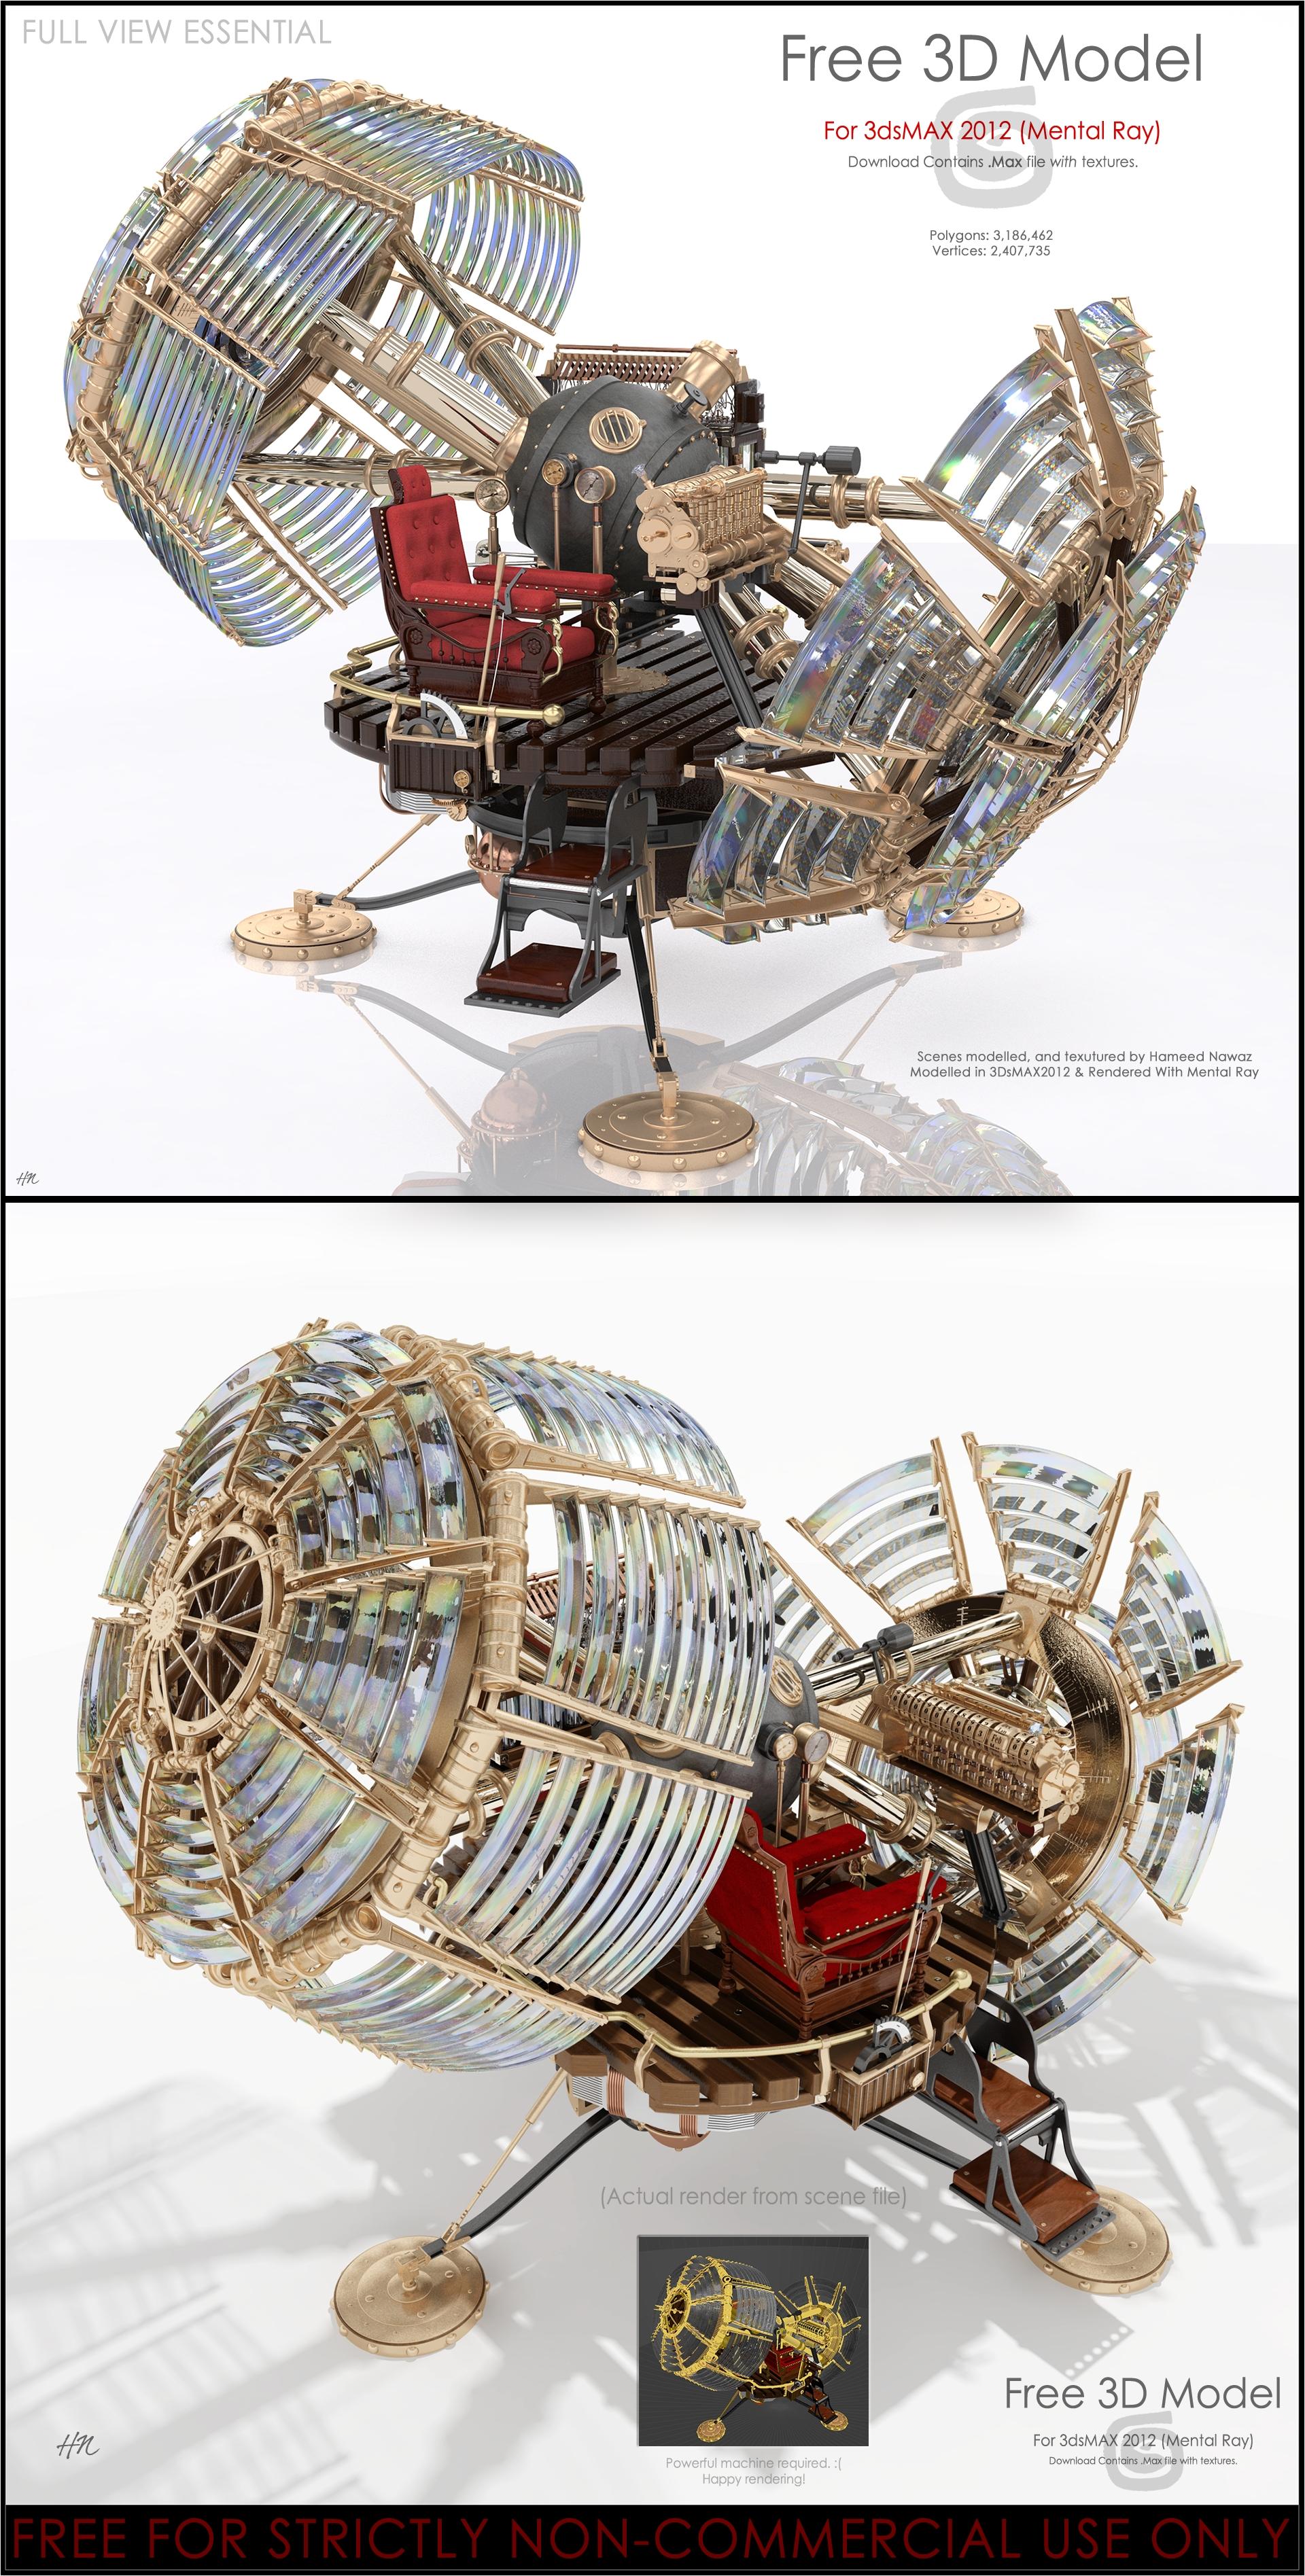 3d Models For Poser And Daz Studio: Time Machine 3D Model For 3DsMAX2012/MentalRAY By Hameed